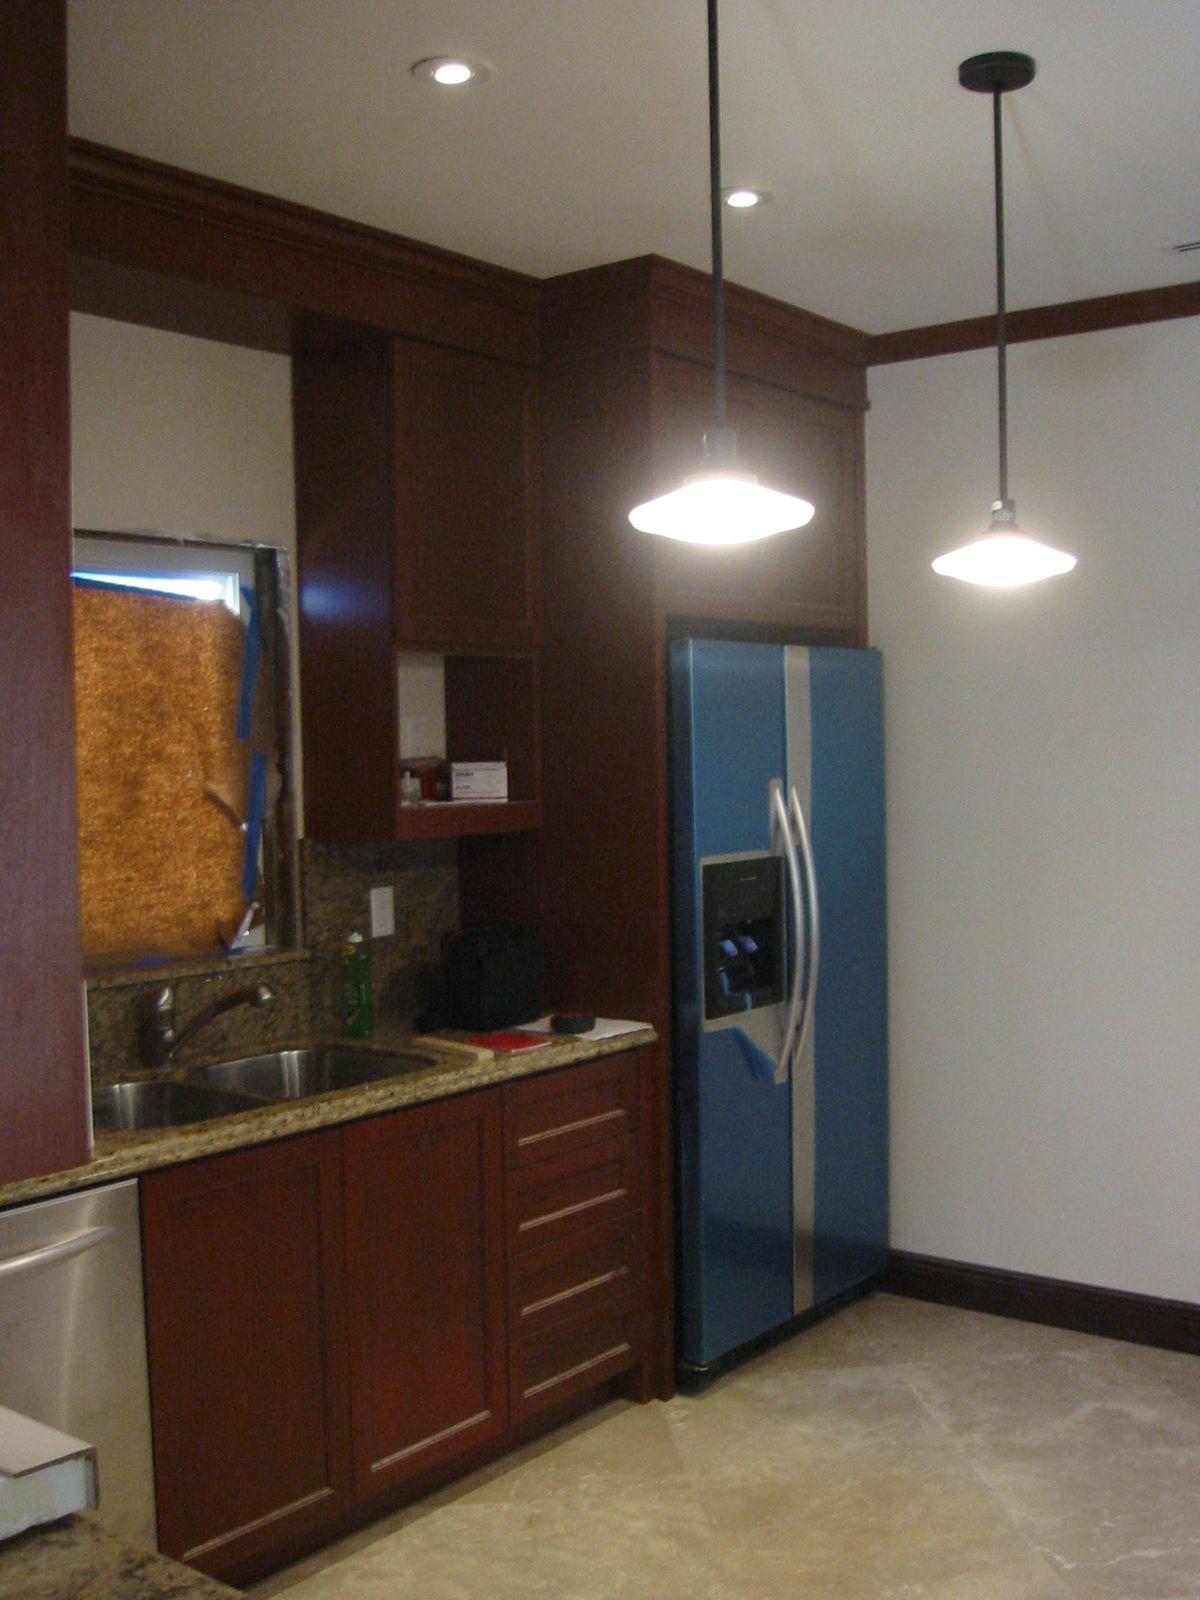 Kitchens-110.jpg